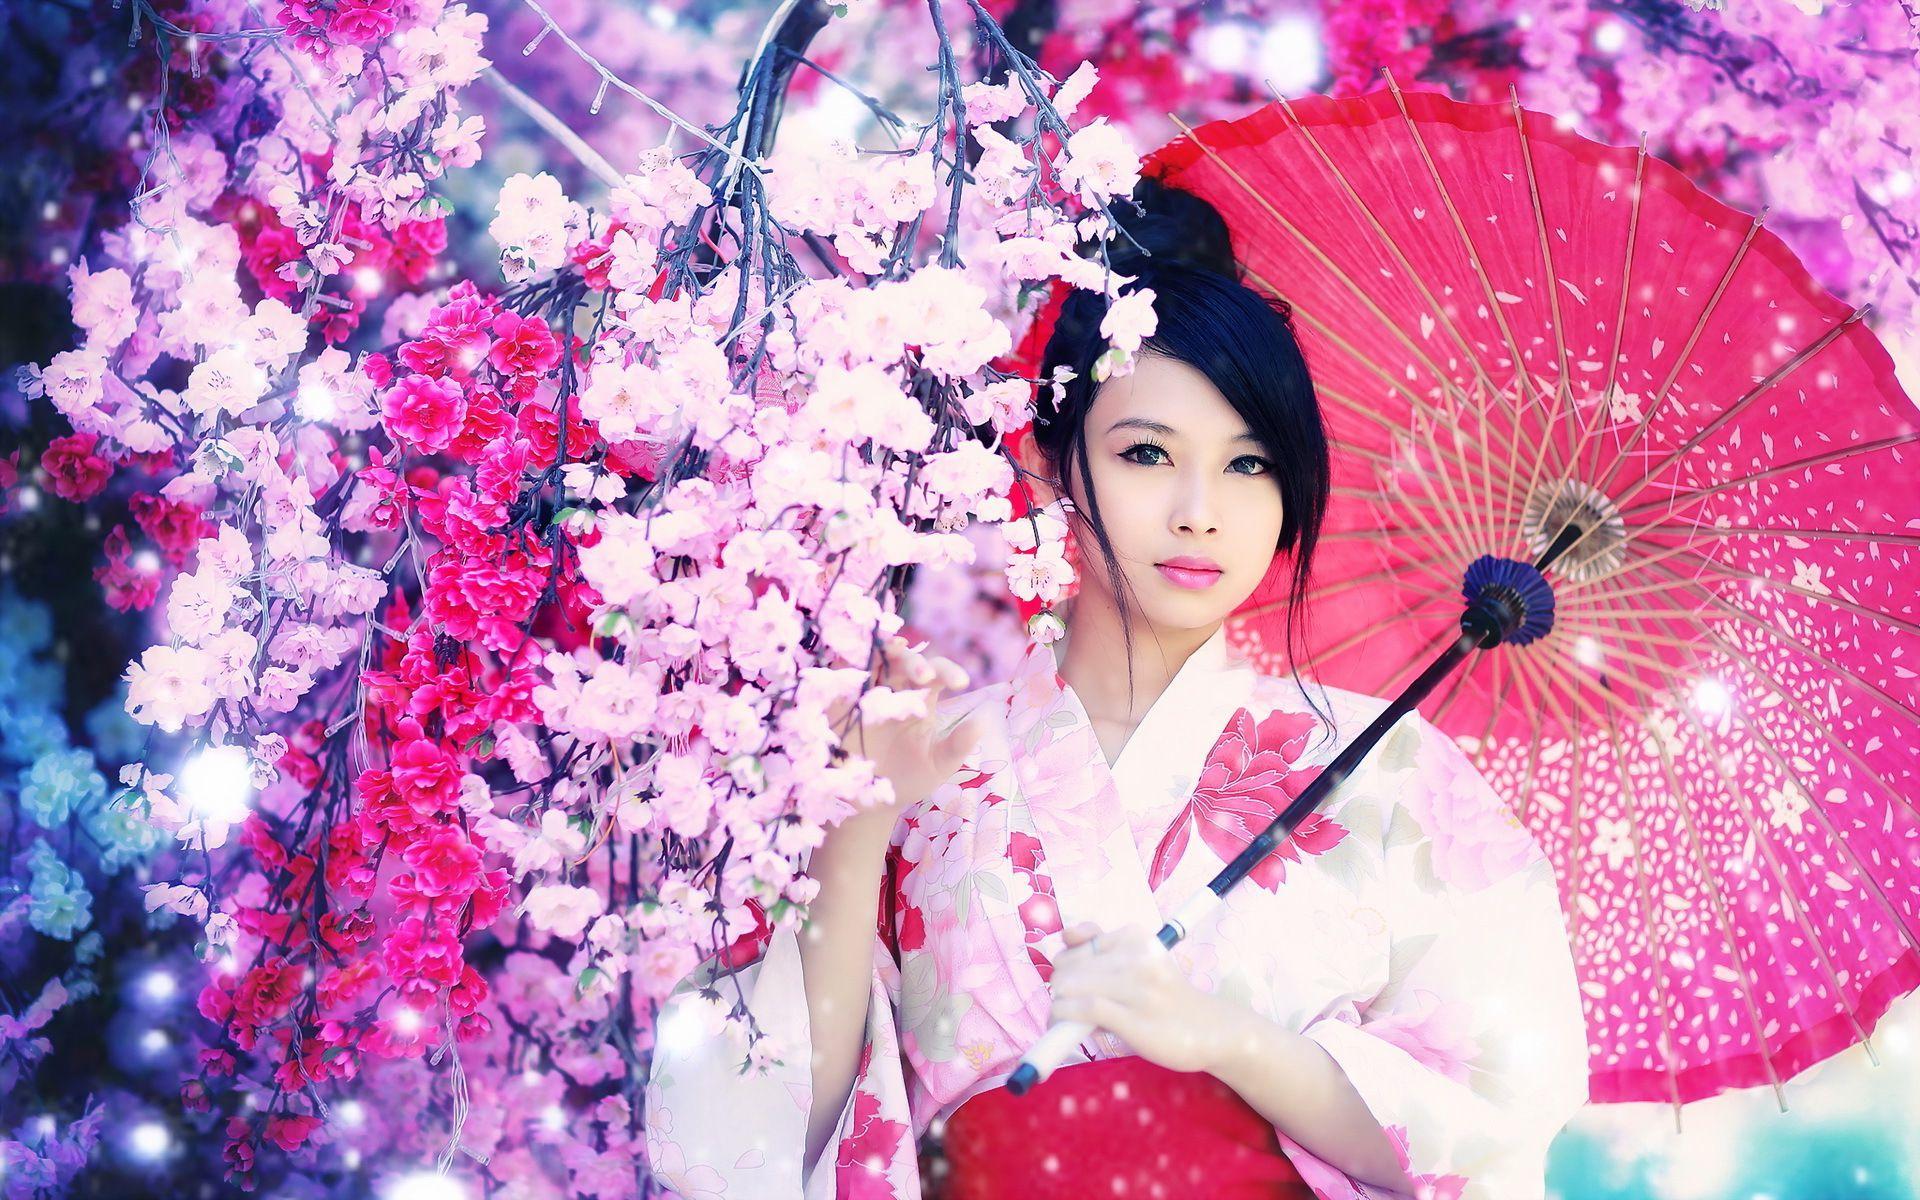 Geisha Wallpaper HD 1920x1200